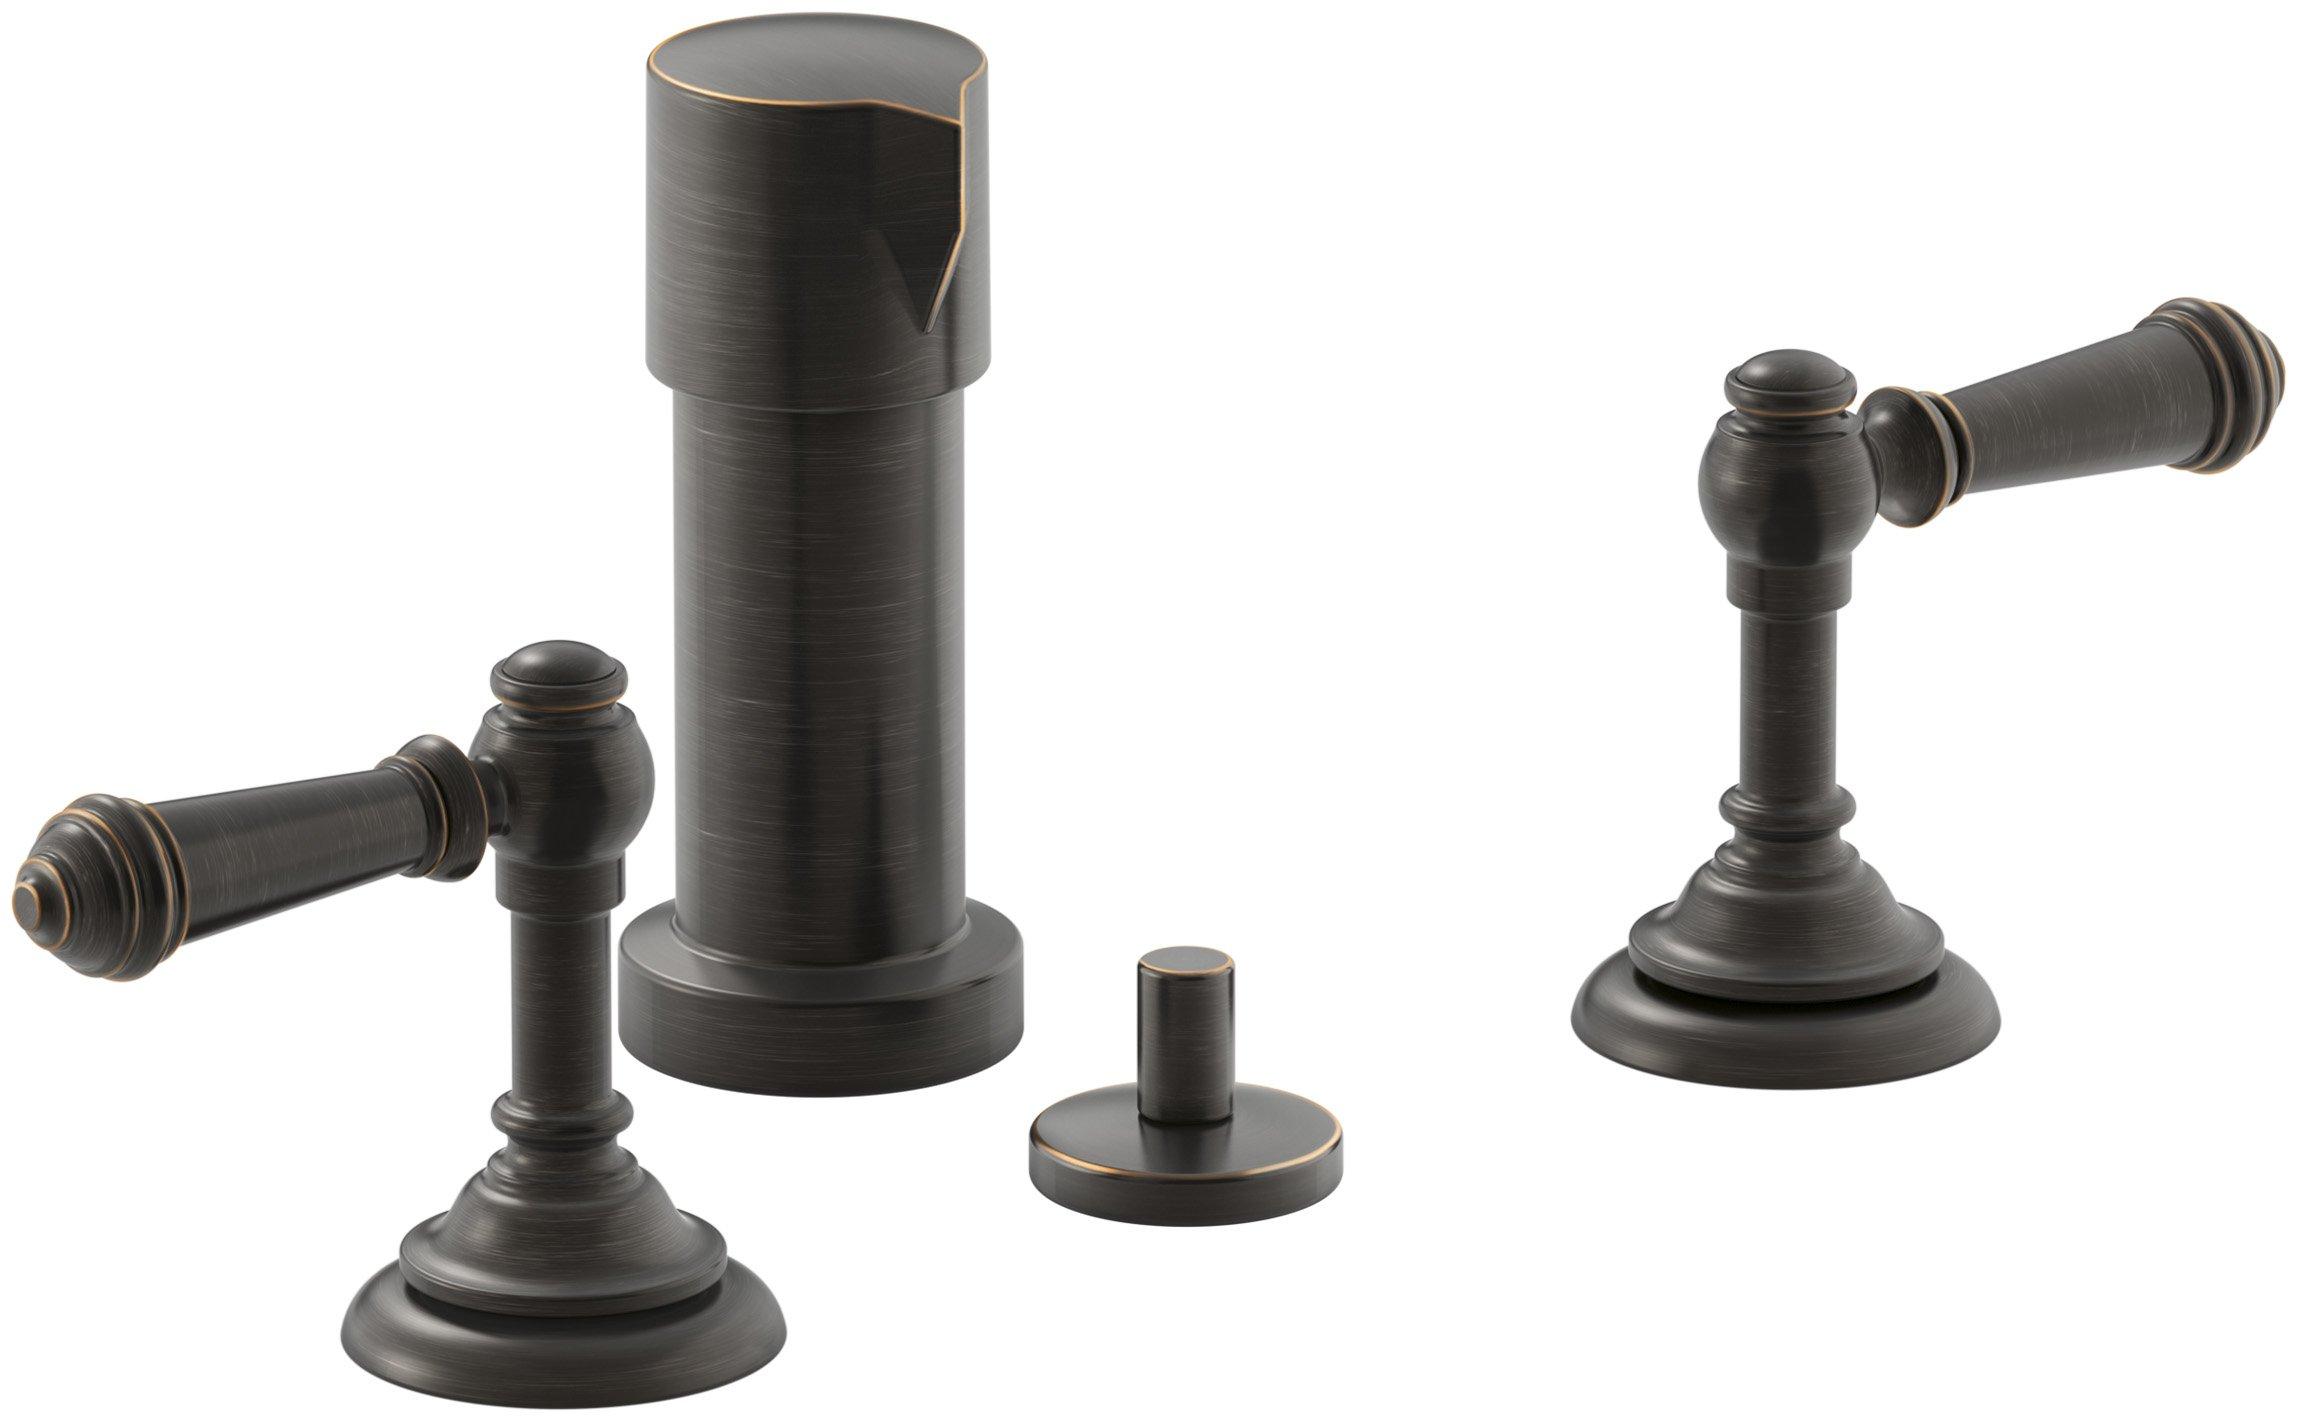 KOHLER K-72765-4-2BZ Artifacts Widespread bidet faucet with lever handles, Oil-Rubbed Bronze by Kohler